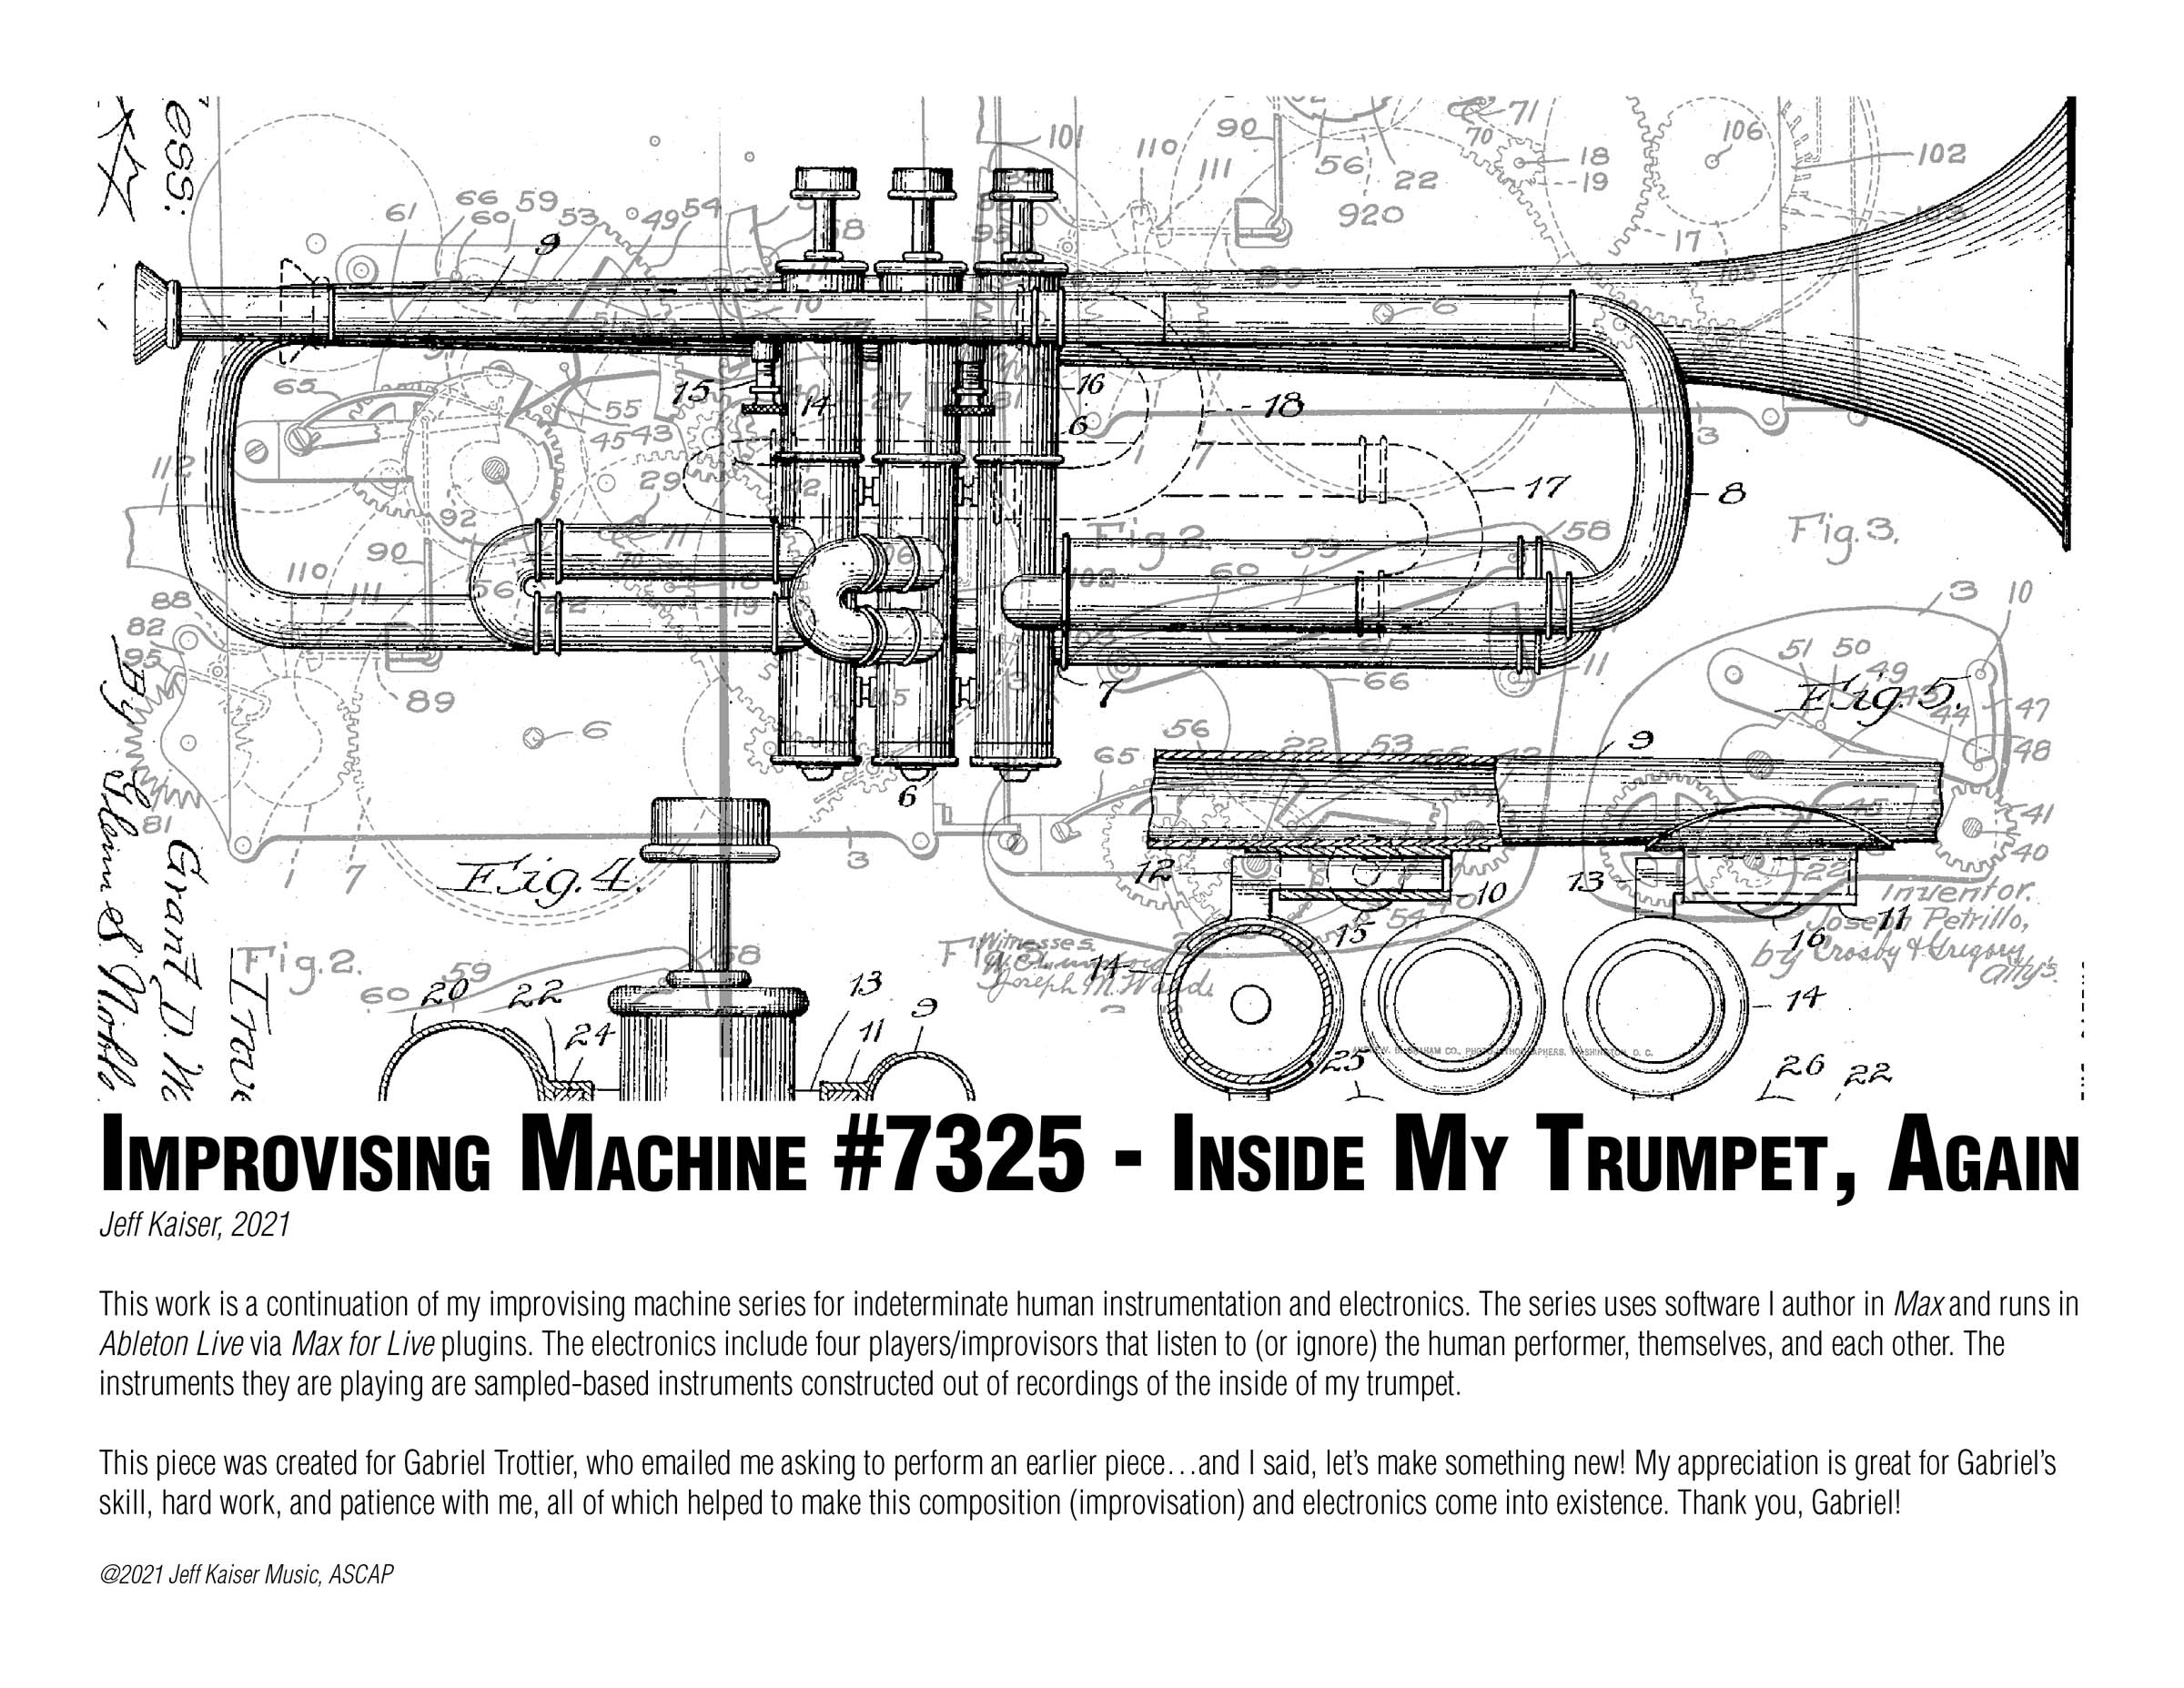 Improvising Machine #7325 - Inside My Trumpet, Again (Score)